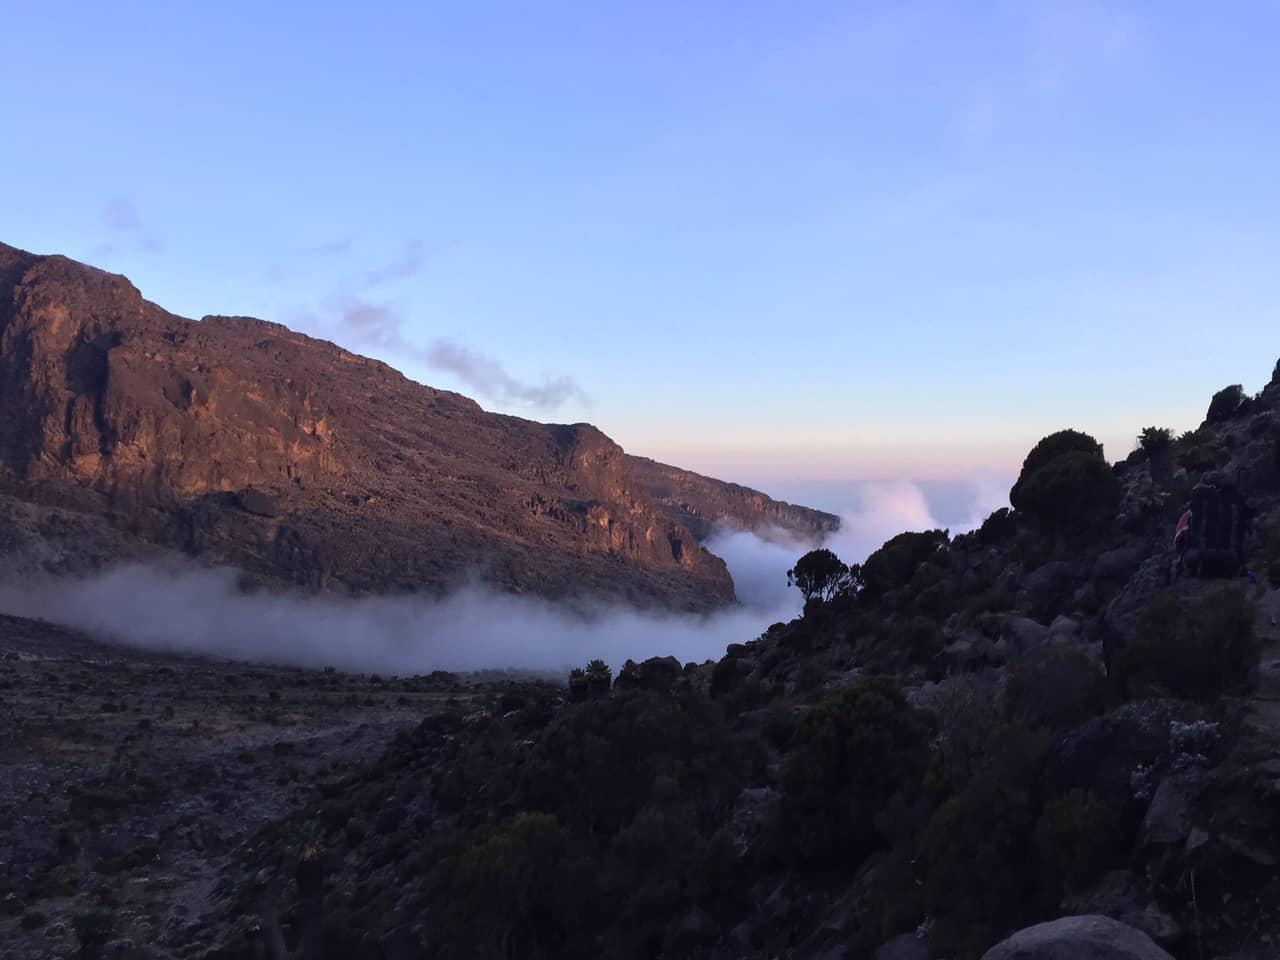 Fred's Kilimanjaro Journey 4